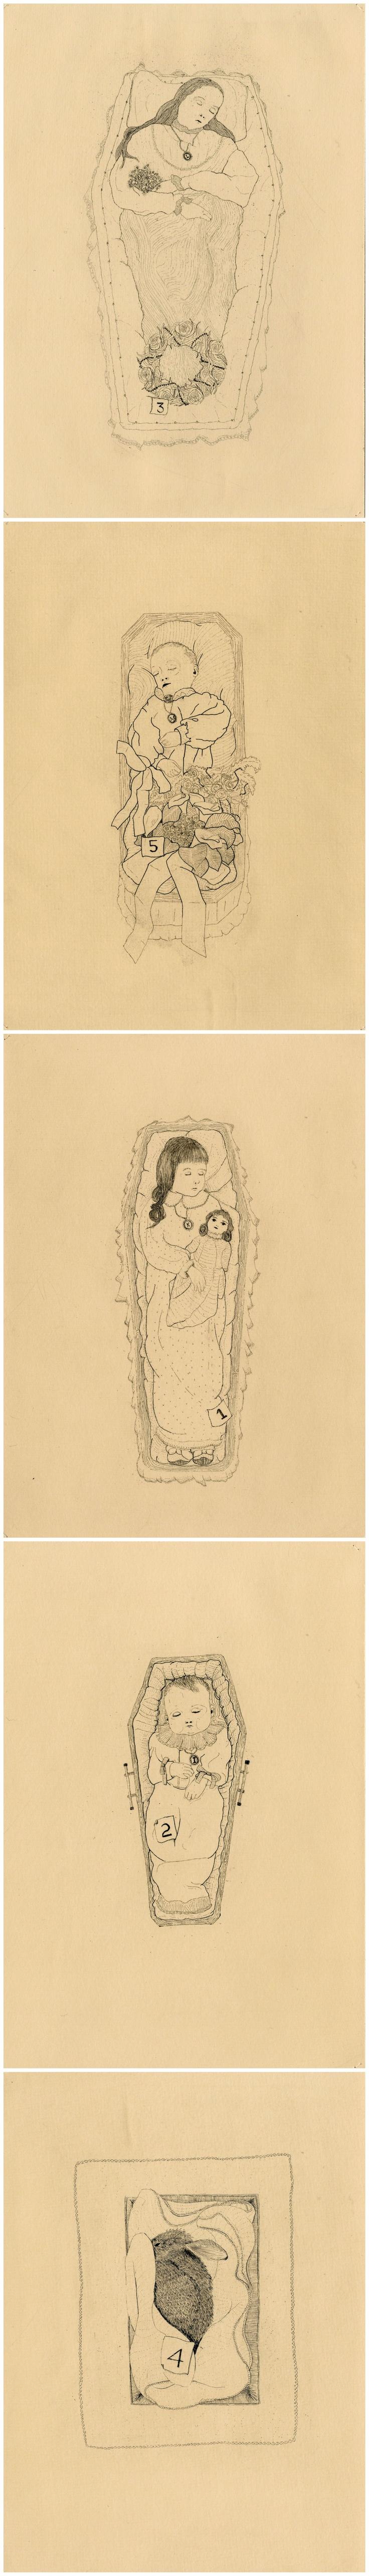 The Hüberman Children and Rabbit // copper etching // Eleanor Phillips